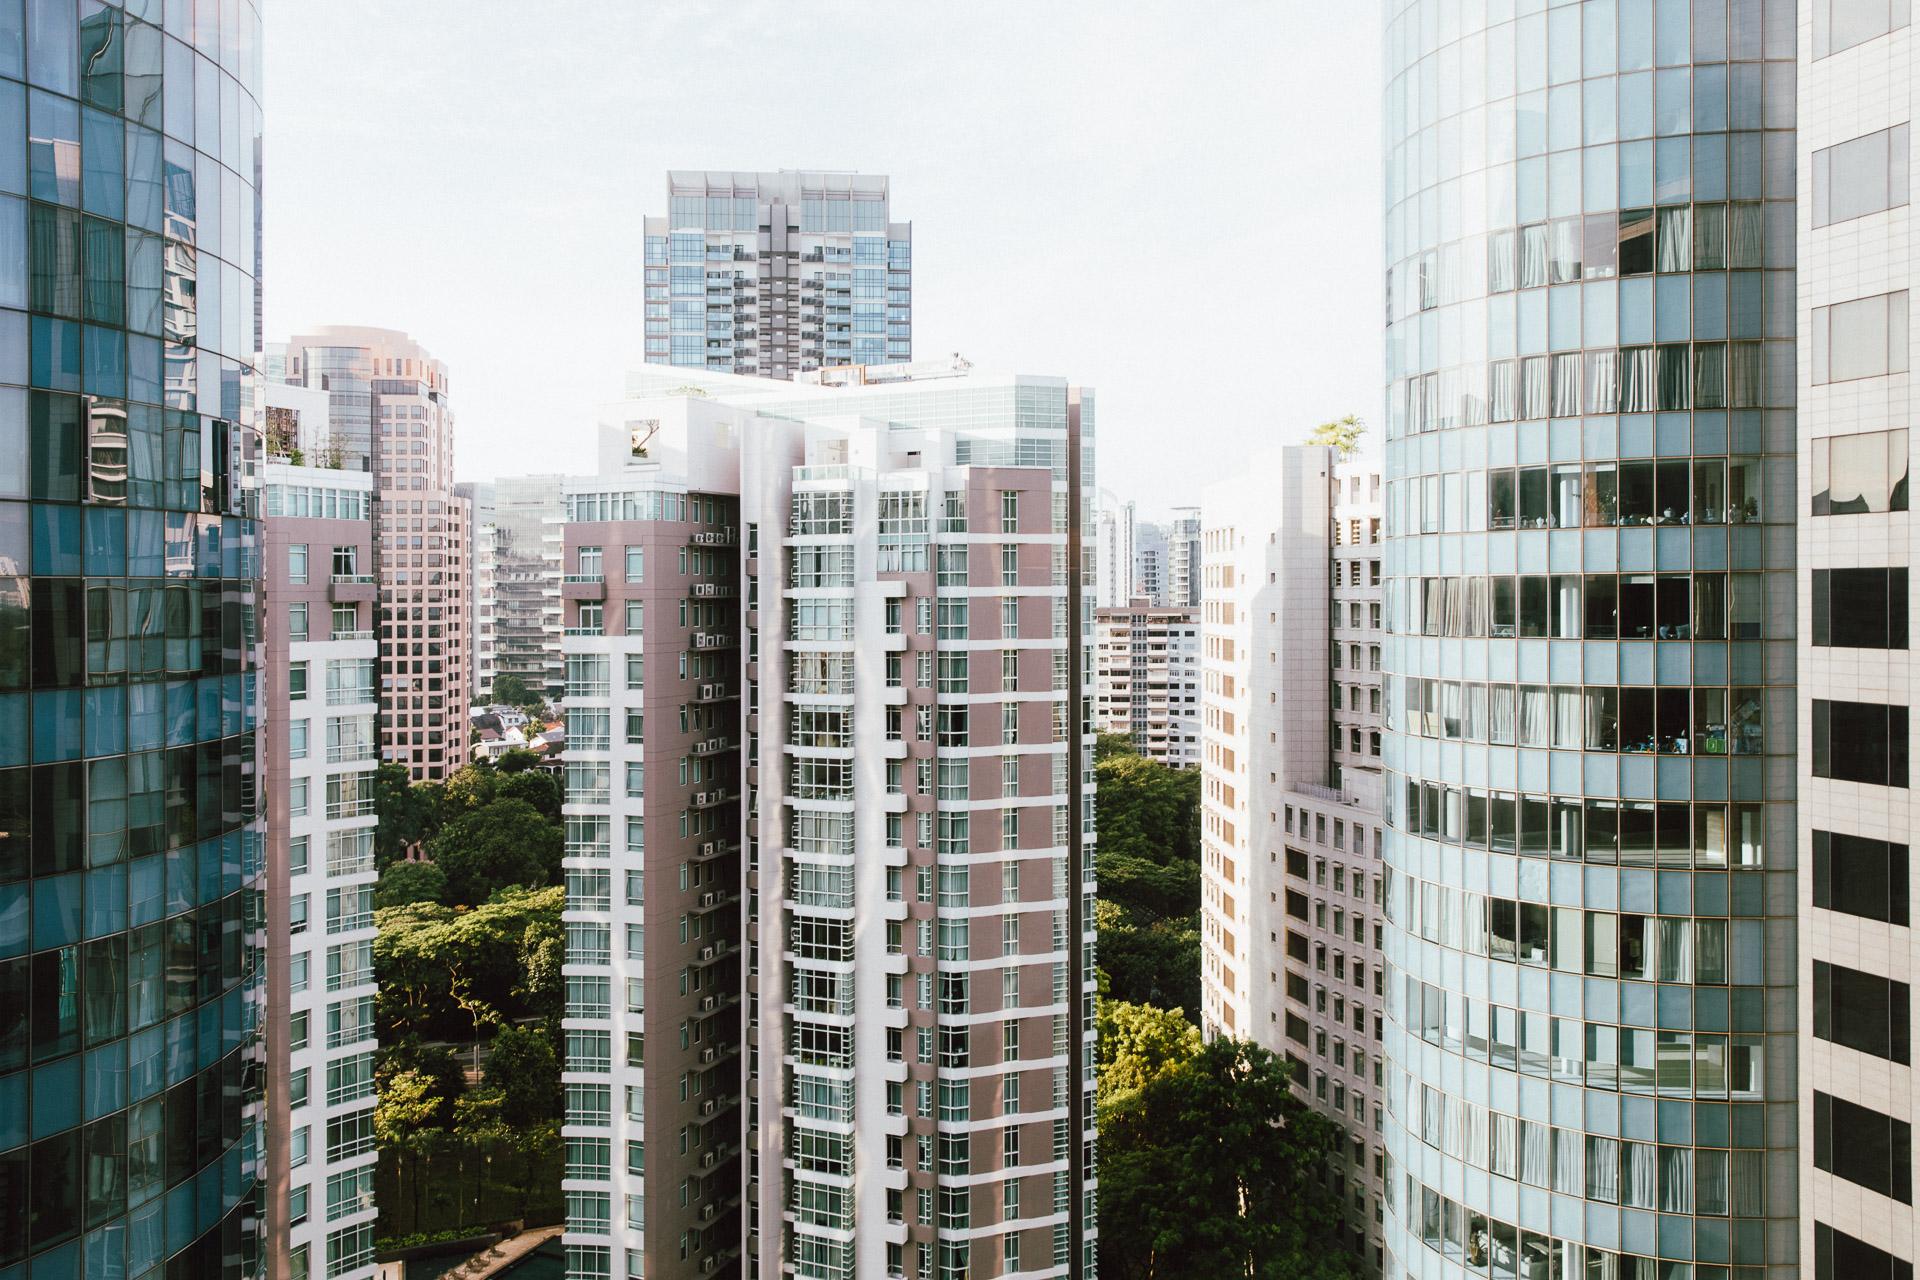 st-regis-singapore-marriott-luxury-hotel-photographer-6.jpg